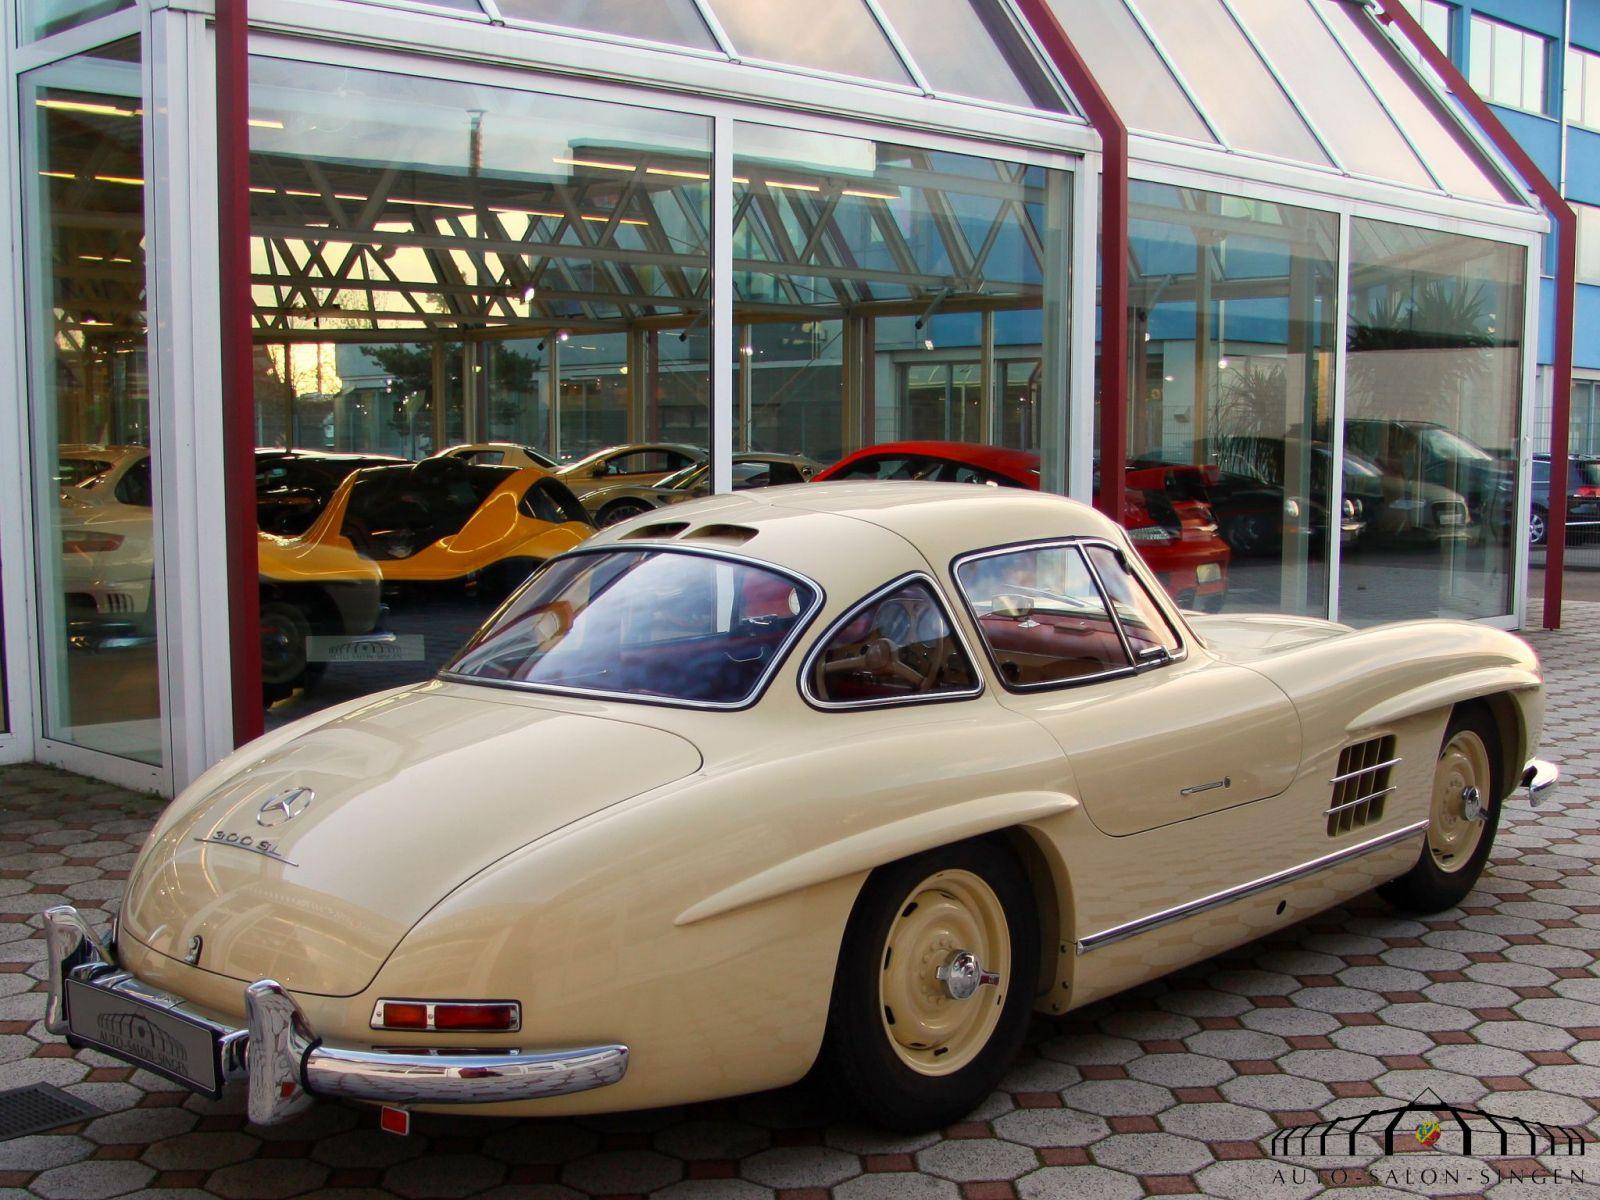 Mercedes benz 300 sl gullwing coup auto salon singen for Mercedes salon